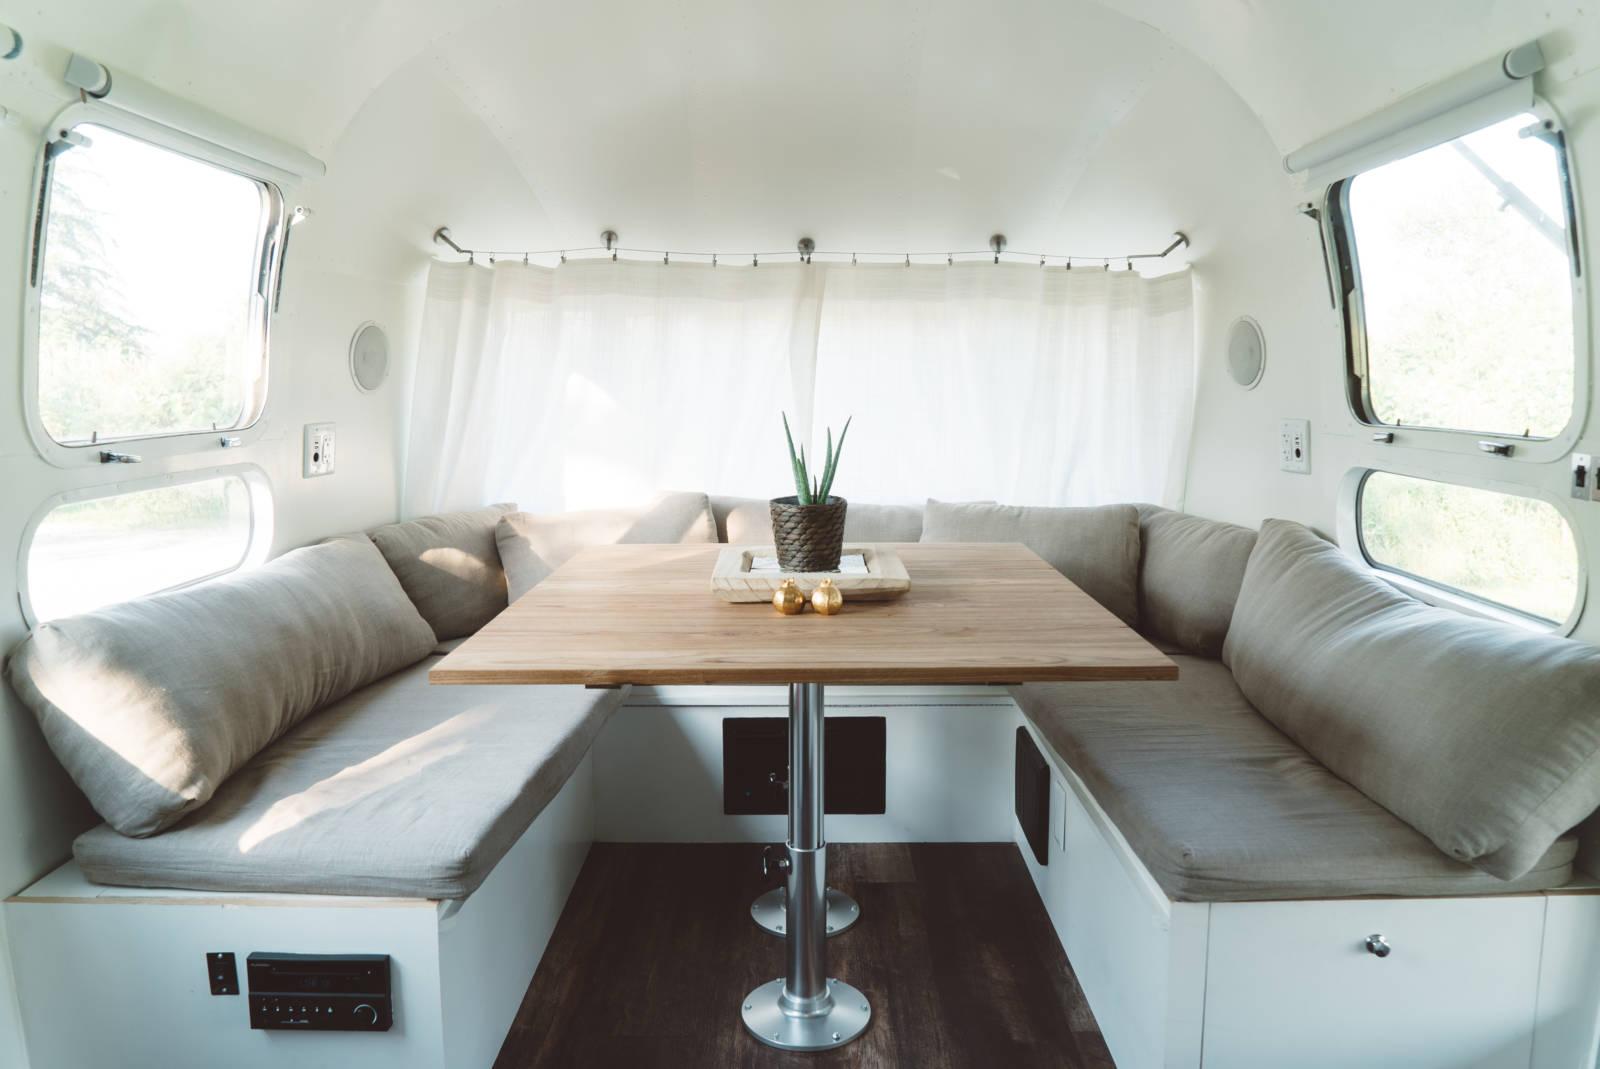 Airstream-Renovation-Cost-Breakdown-Living-Room.jpg